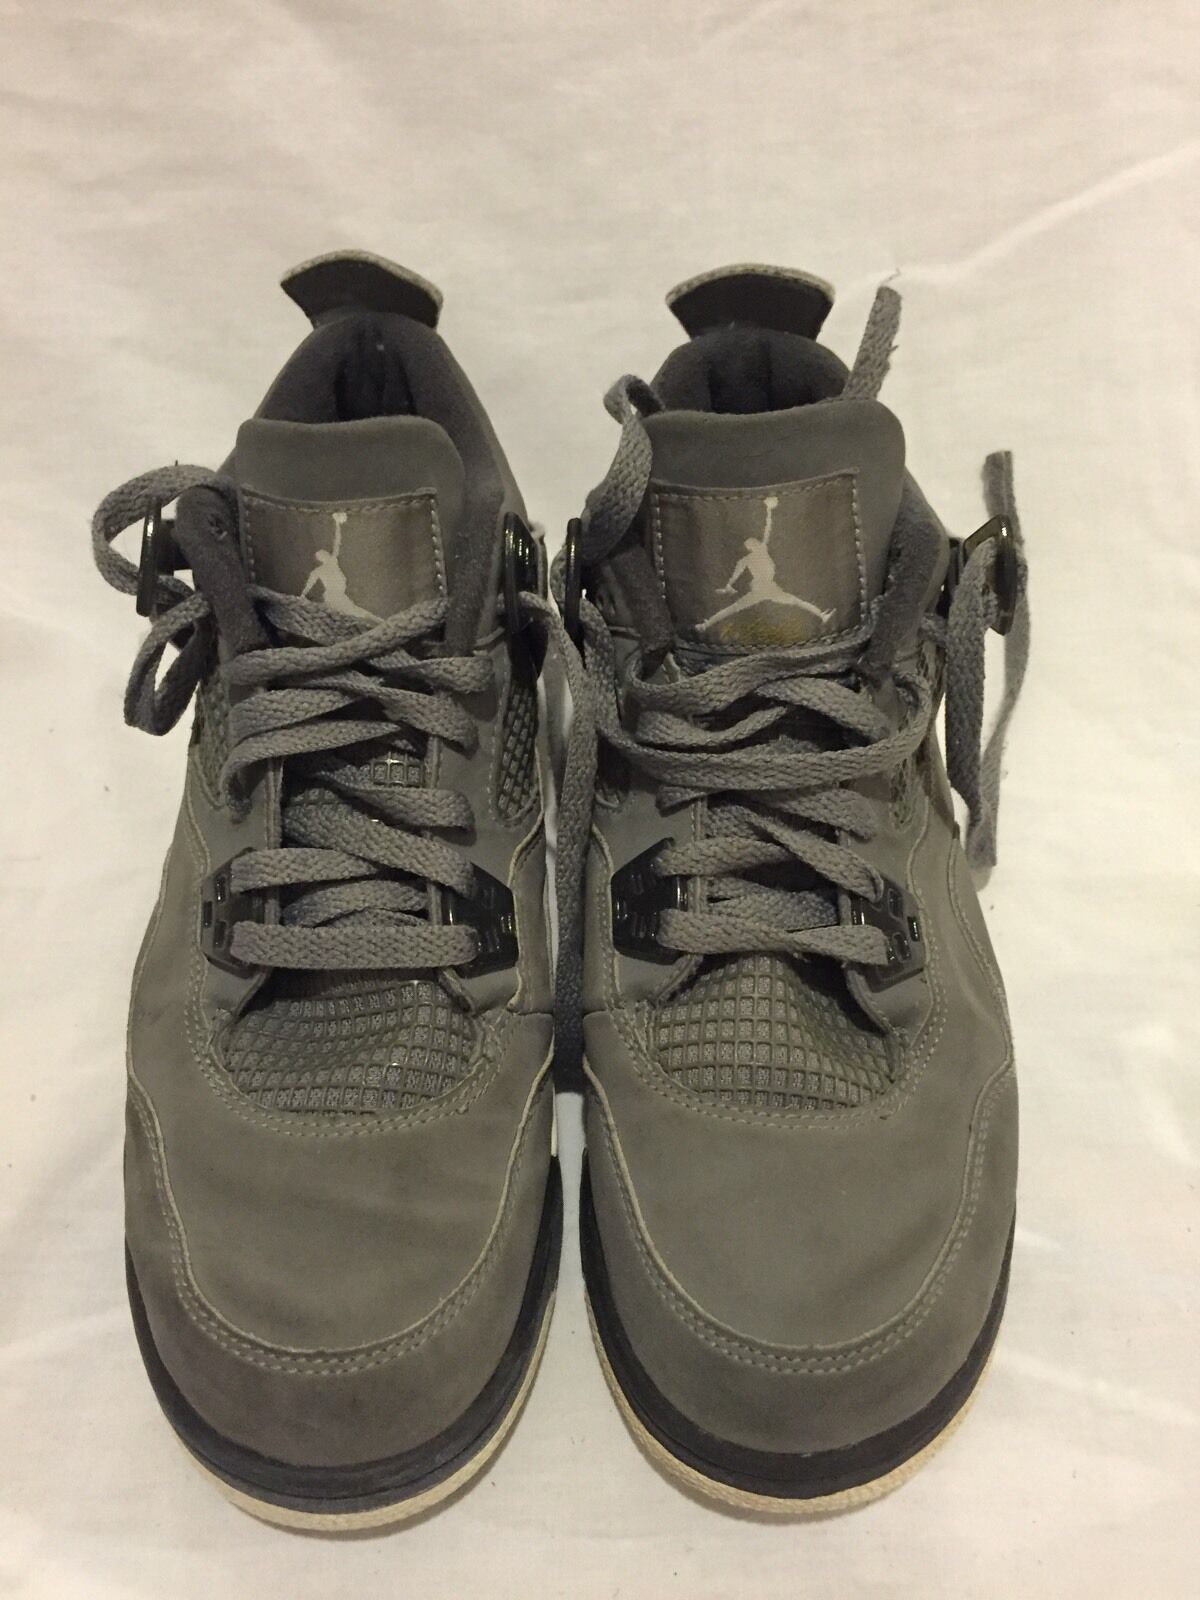 2008 Nike Air Jordan IV 4 Retro GS 308498 001 US Sz 6.5 Y Men's 7 W's 8.5